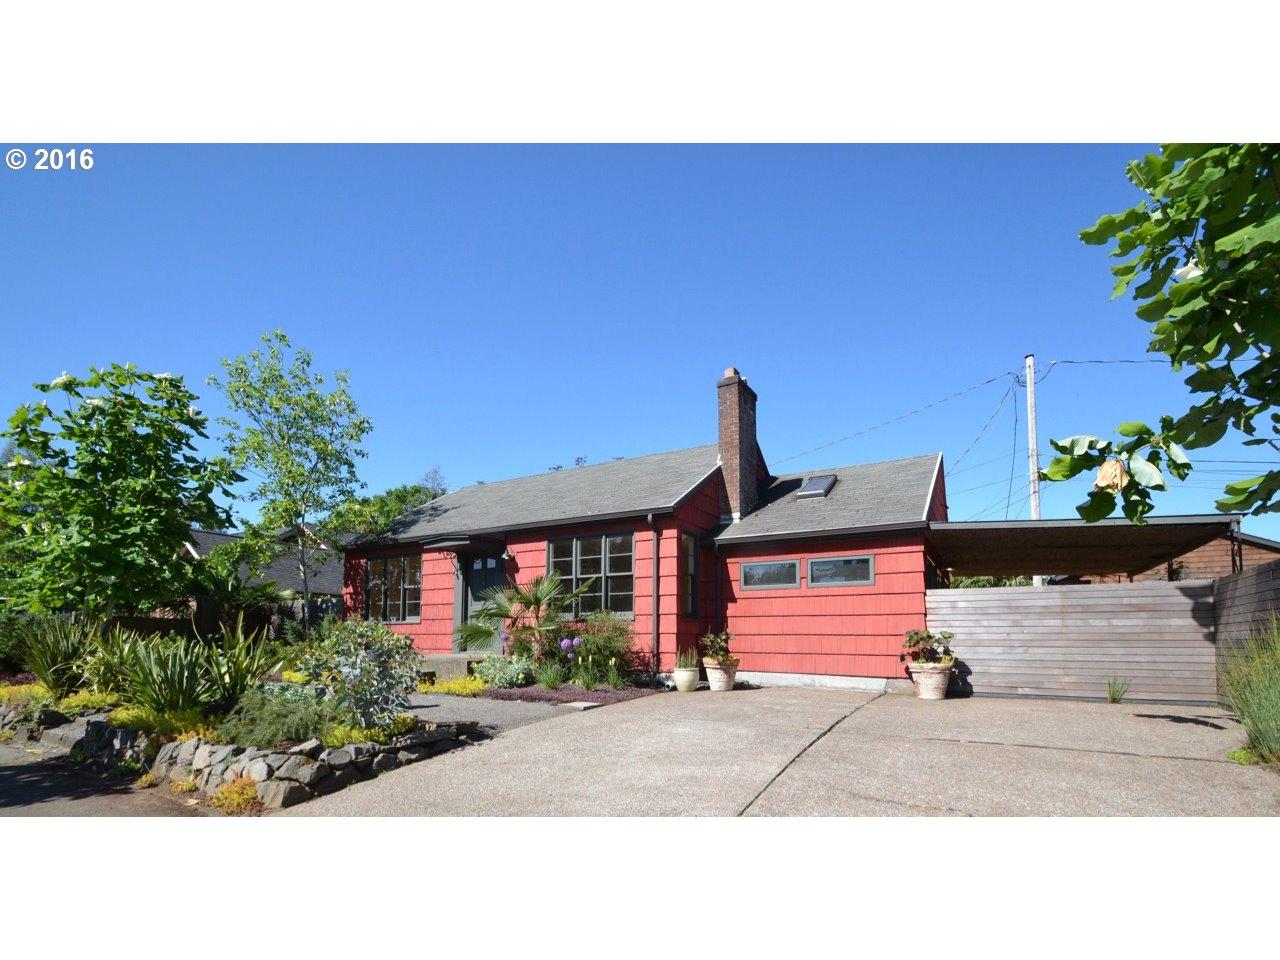 5909 N CURTIS AVE, Portland, OR 97217